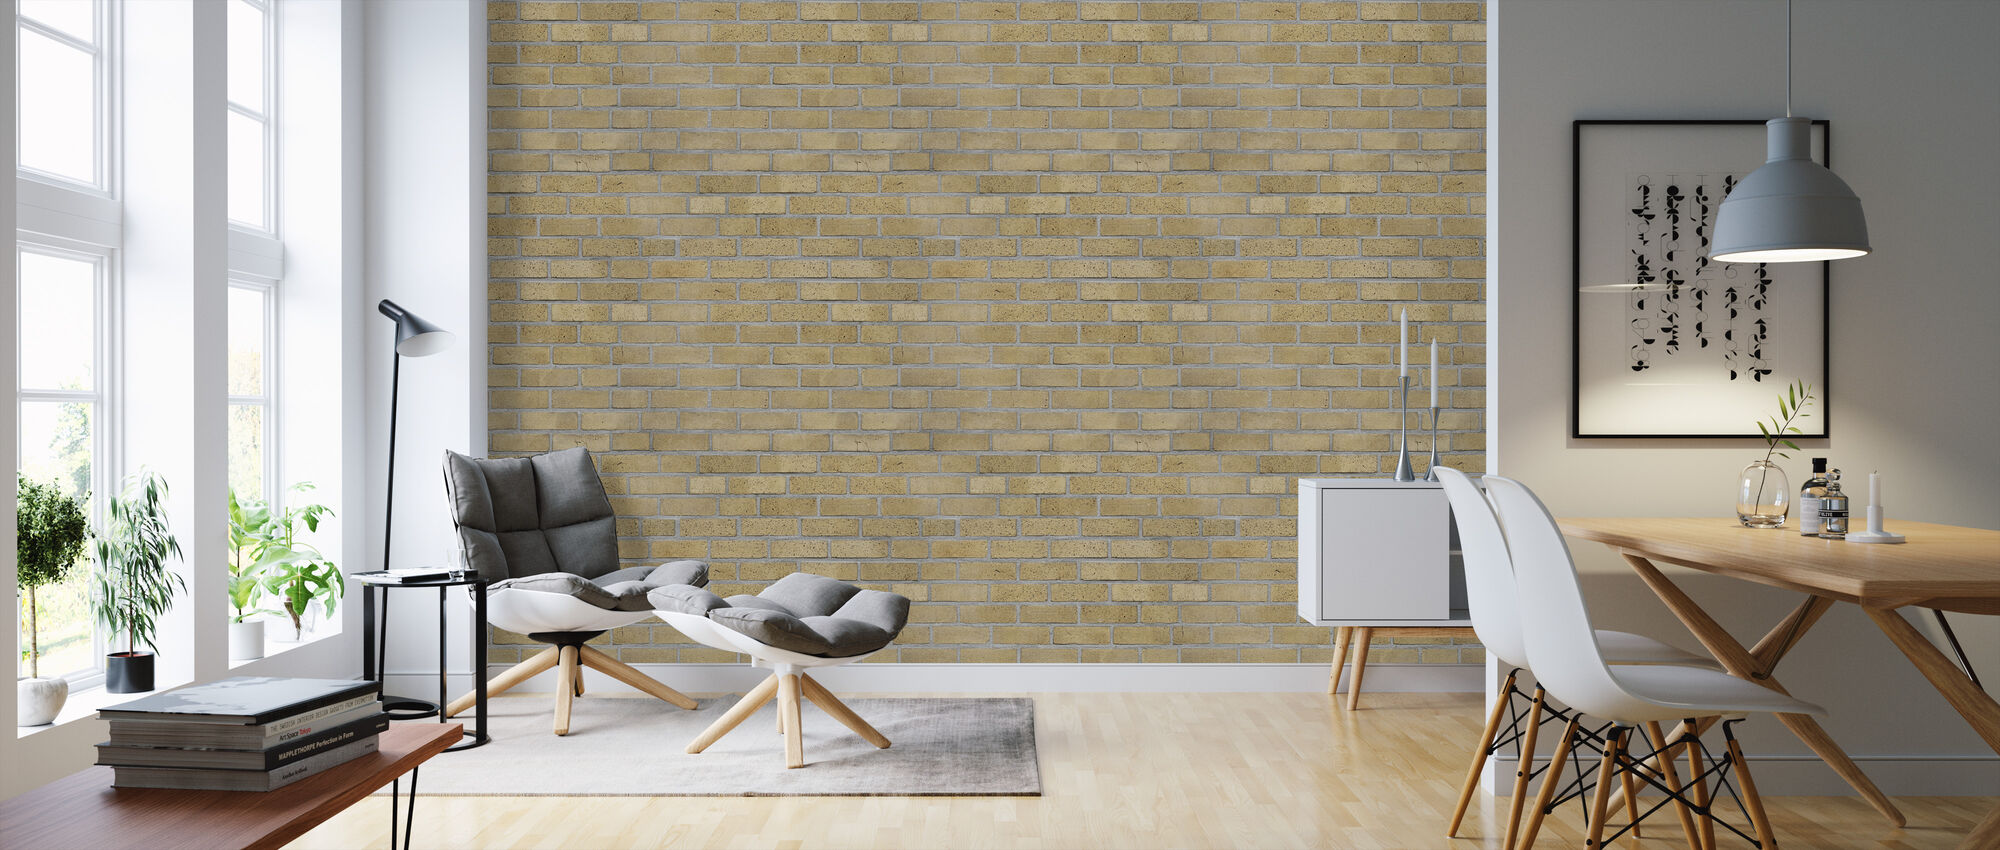 Light Yellow Brick Wall - Wallpaper - Living Room